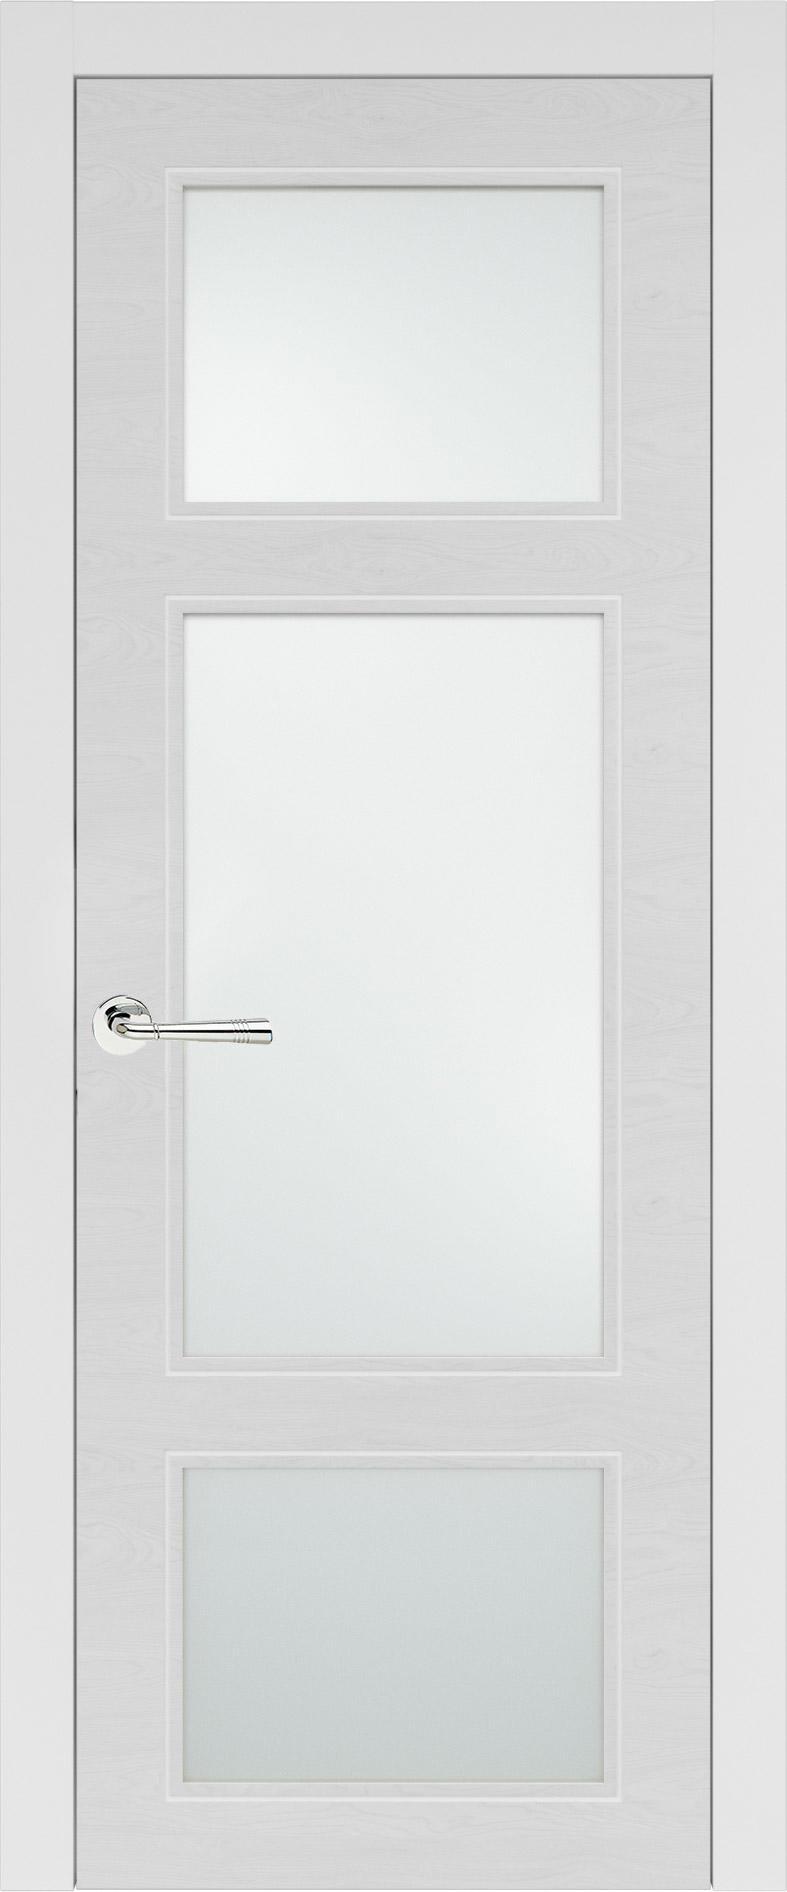 Siena Neo Classic цвет - Белая эмаль по шпону (RAL 9003) Со стеклом (ДО)